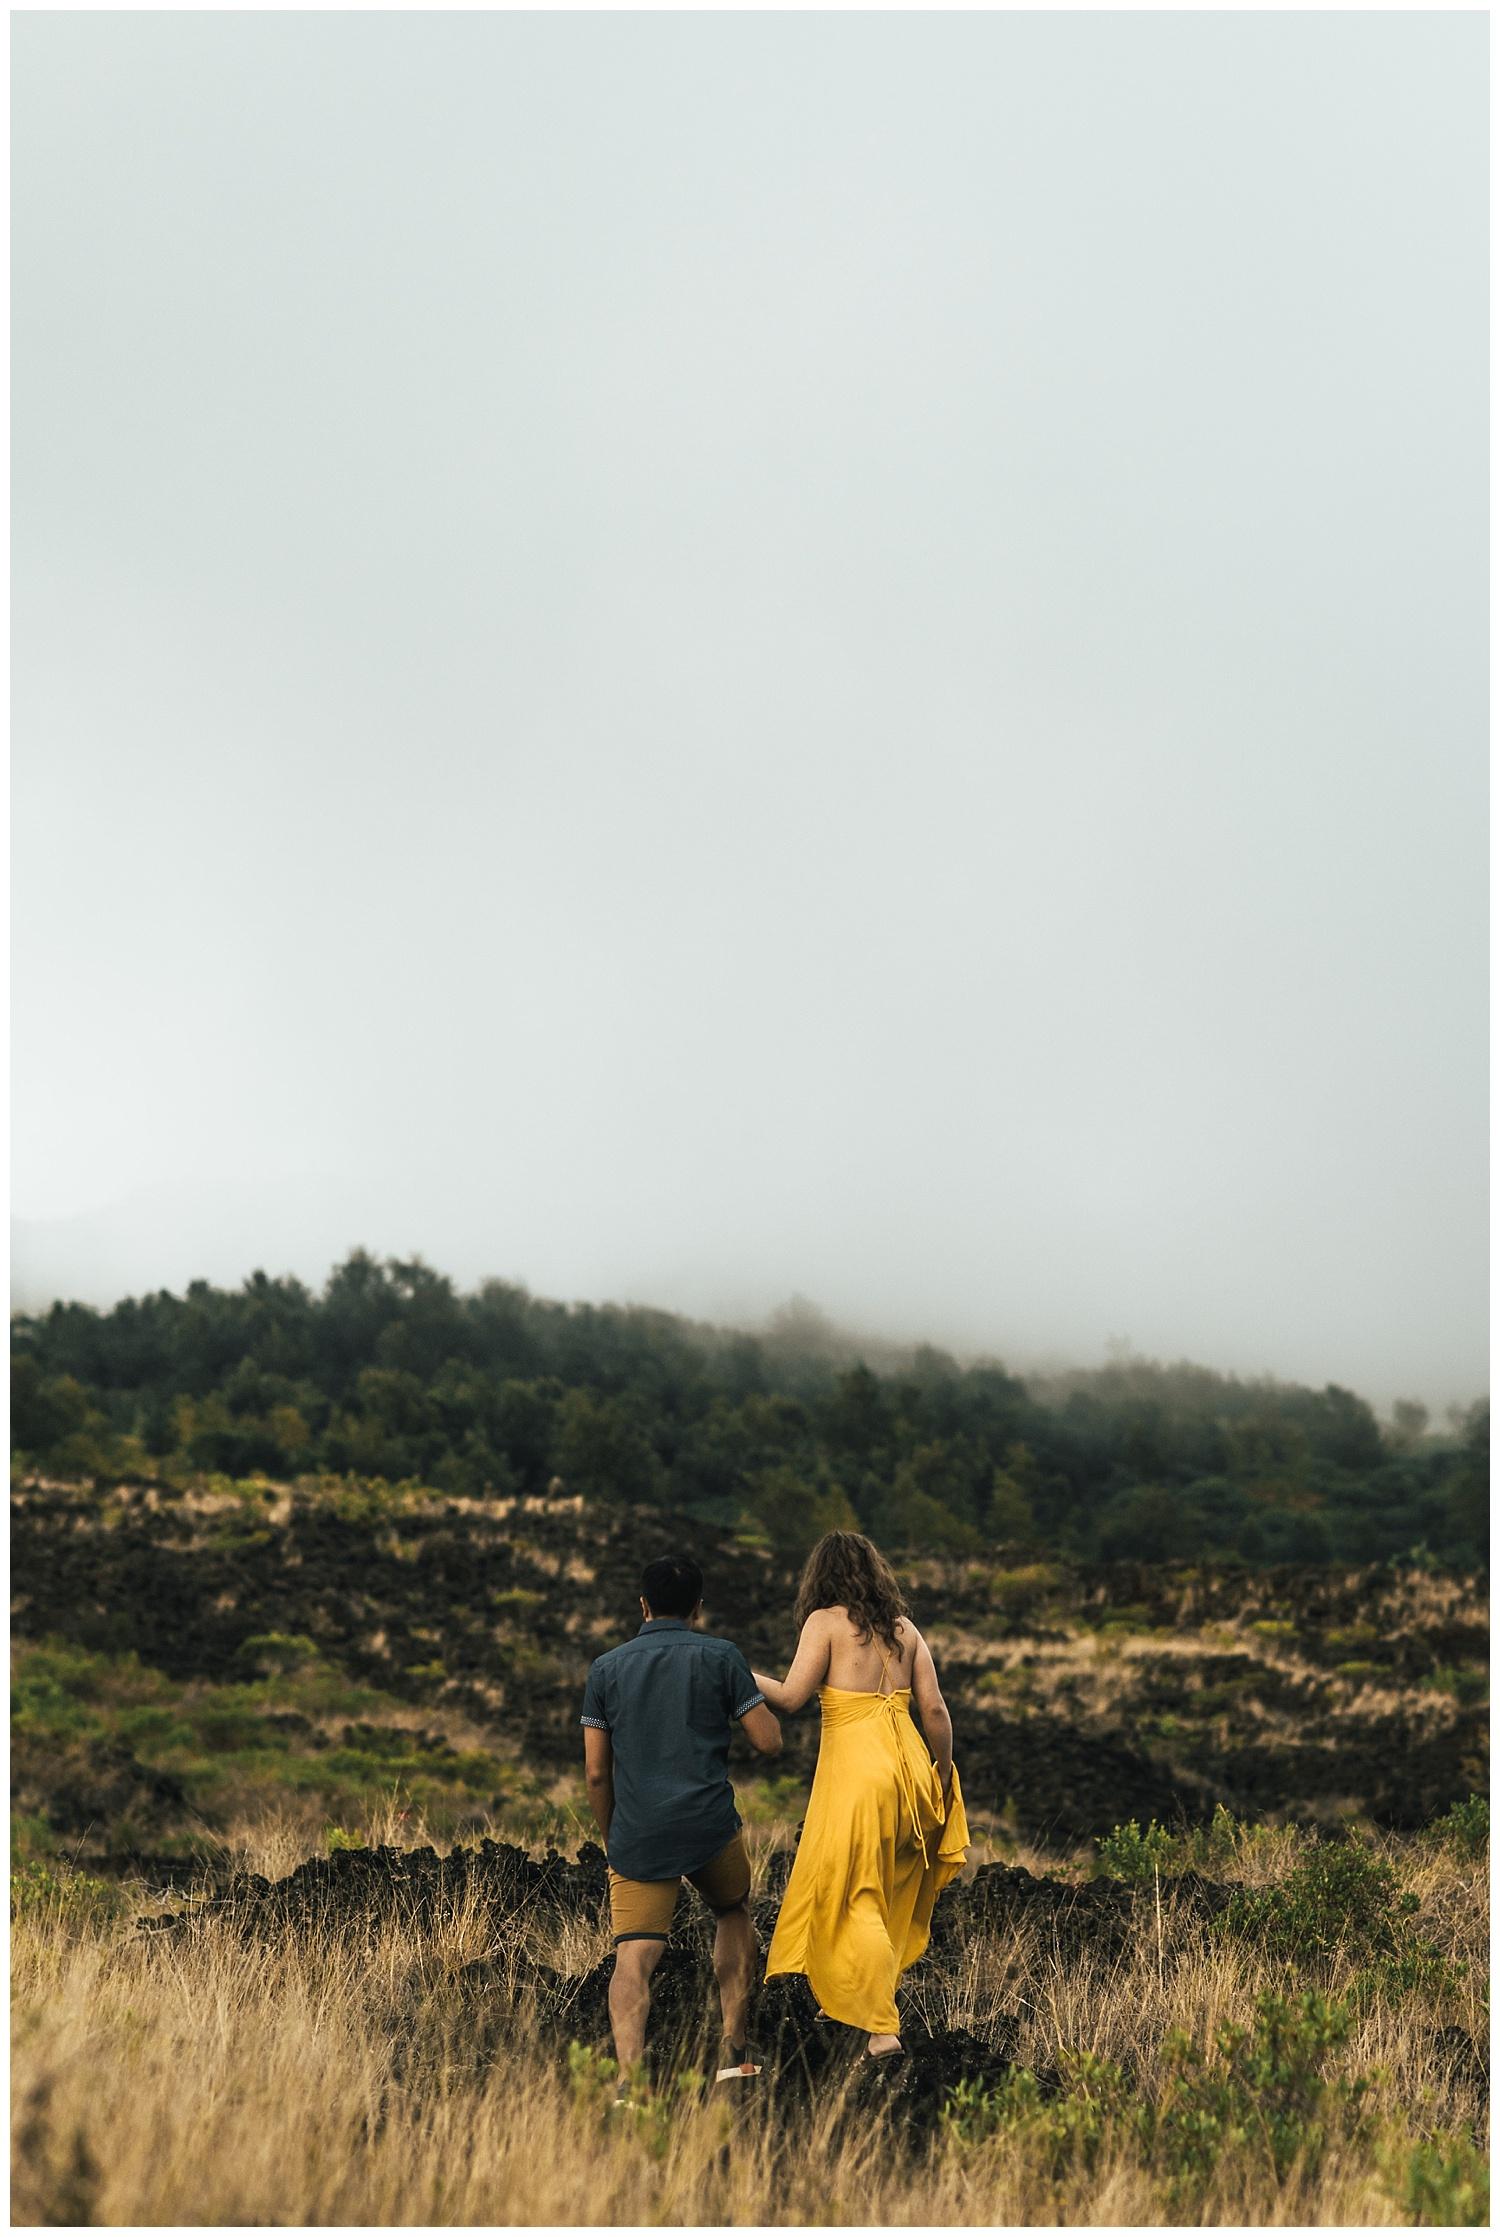 Hawaii-Kaupo-Maui-Engagement-session-ellopement-Jen+aaron8.jpg